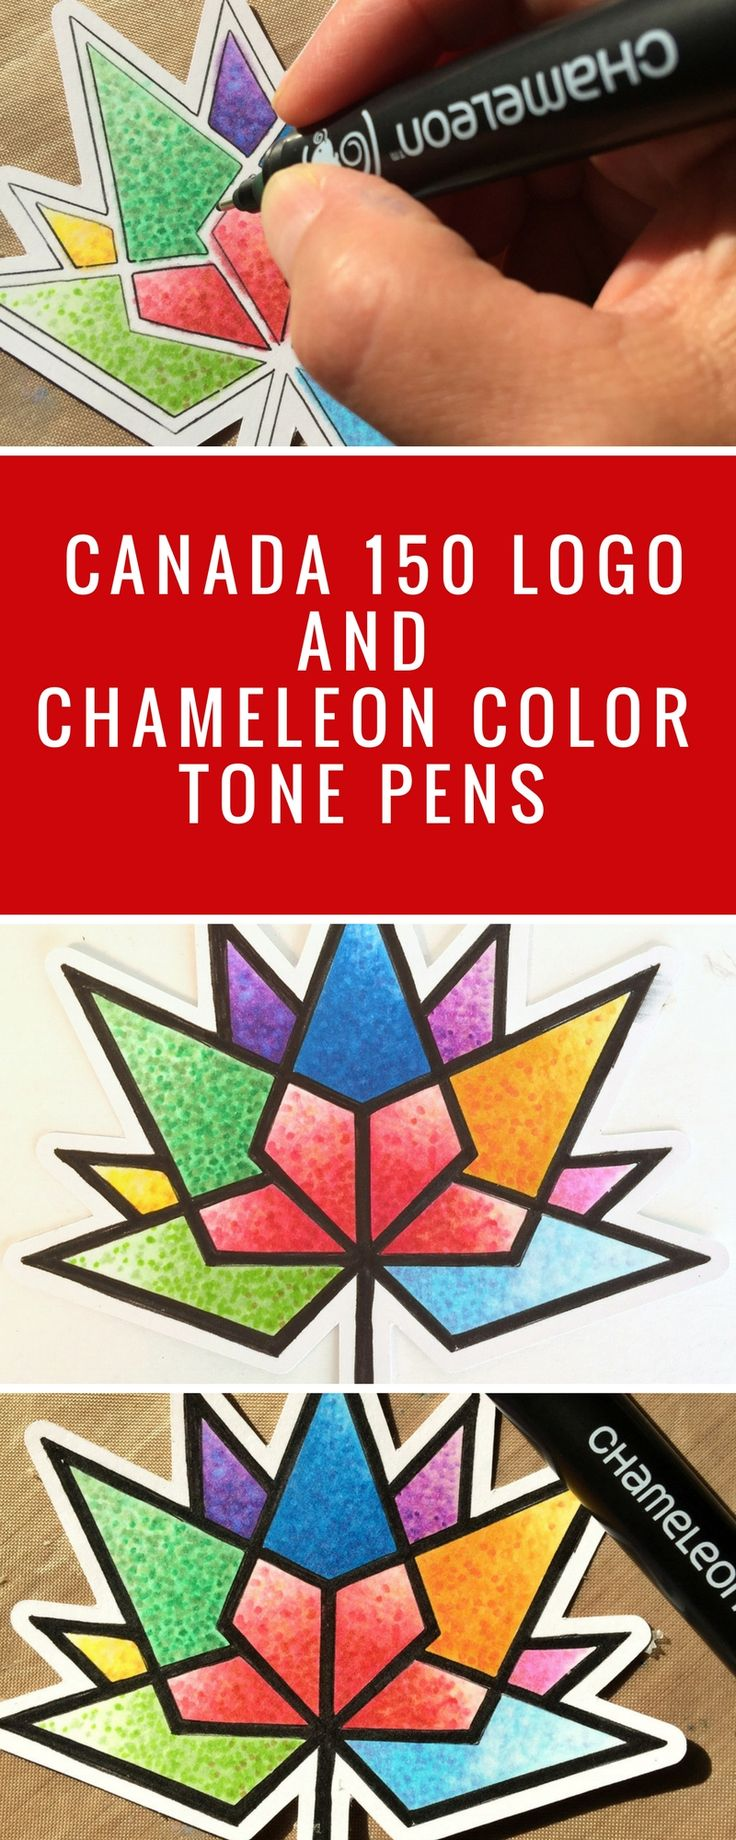 Canada 150 Logo | Design With Chameleon Pens | Download FREE Canada 150 Logo | Adult Coloring  #adultcoloring #coloring #canada150